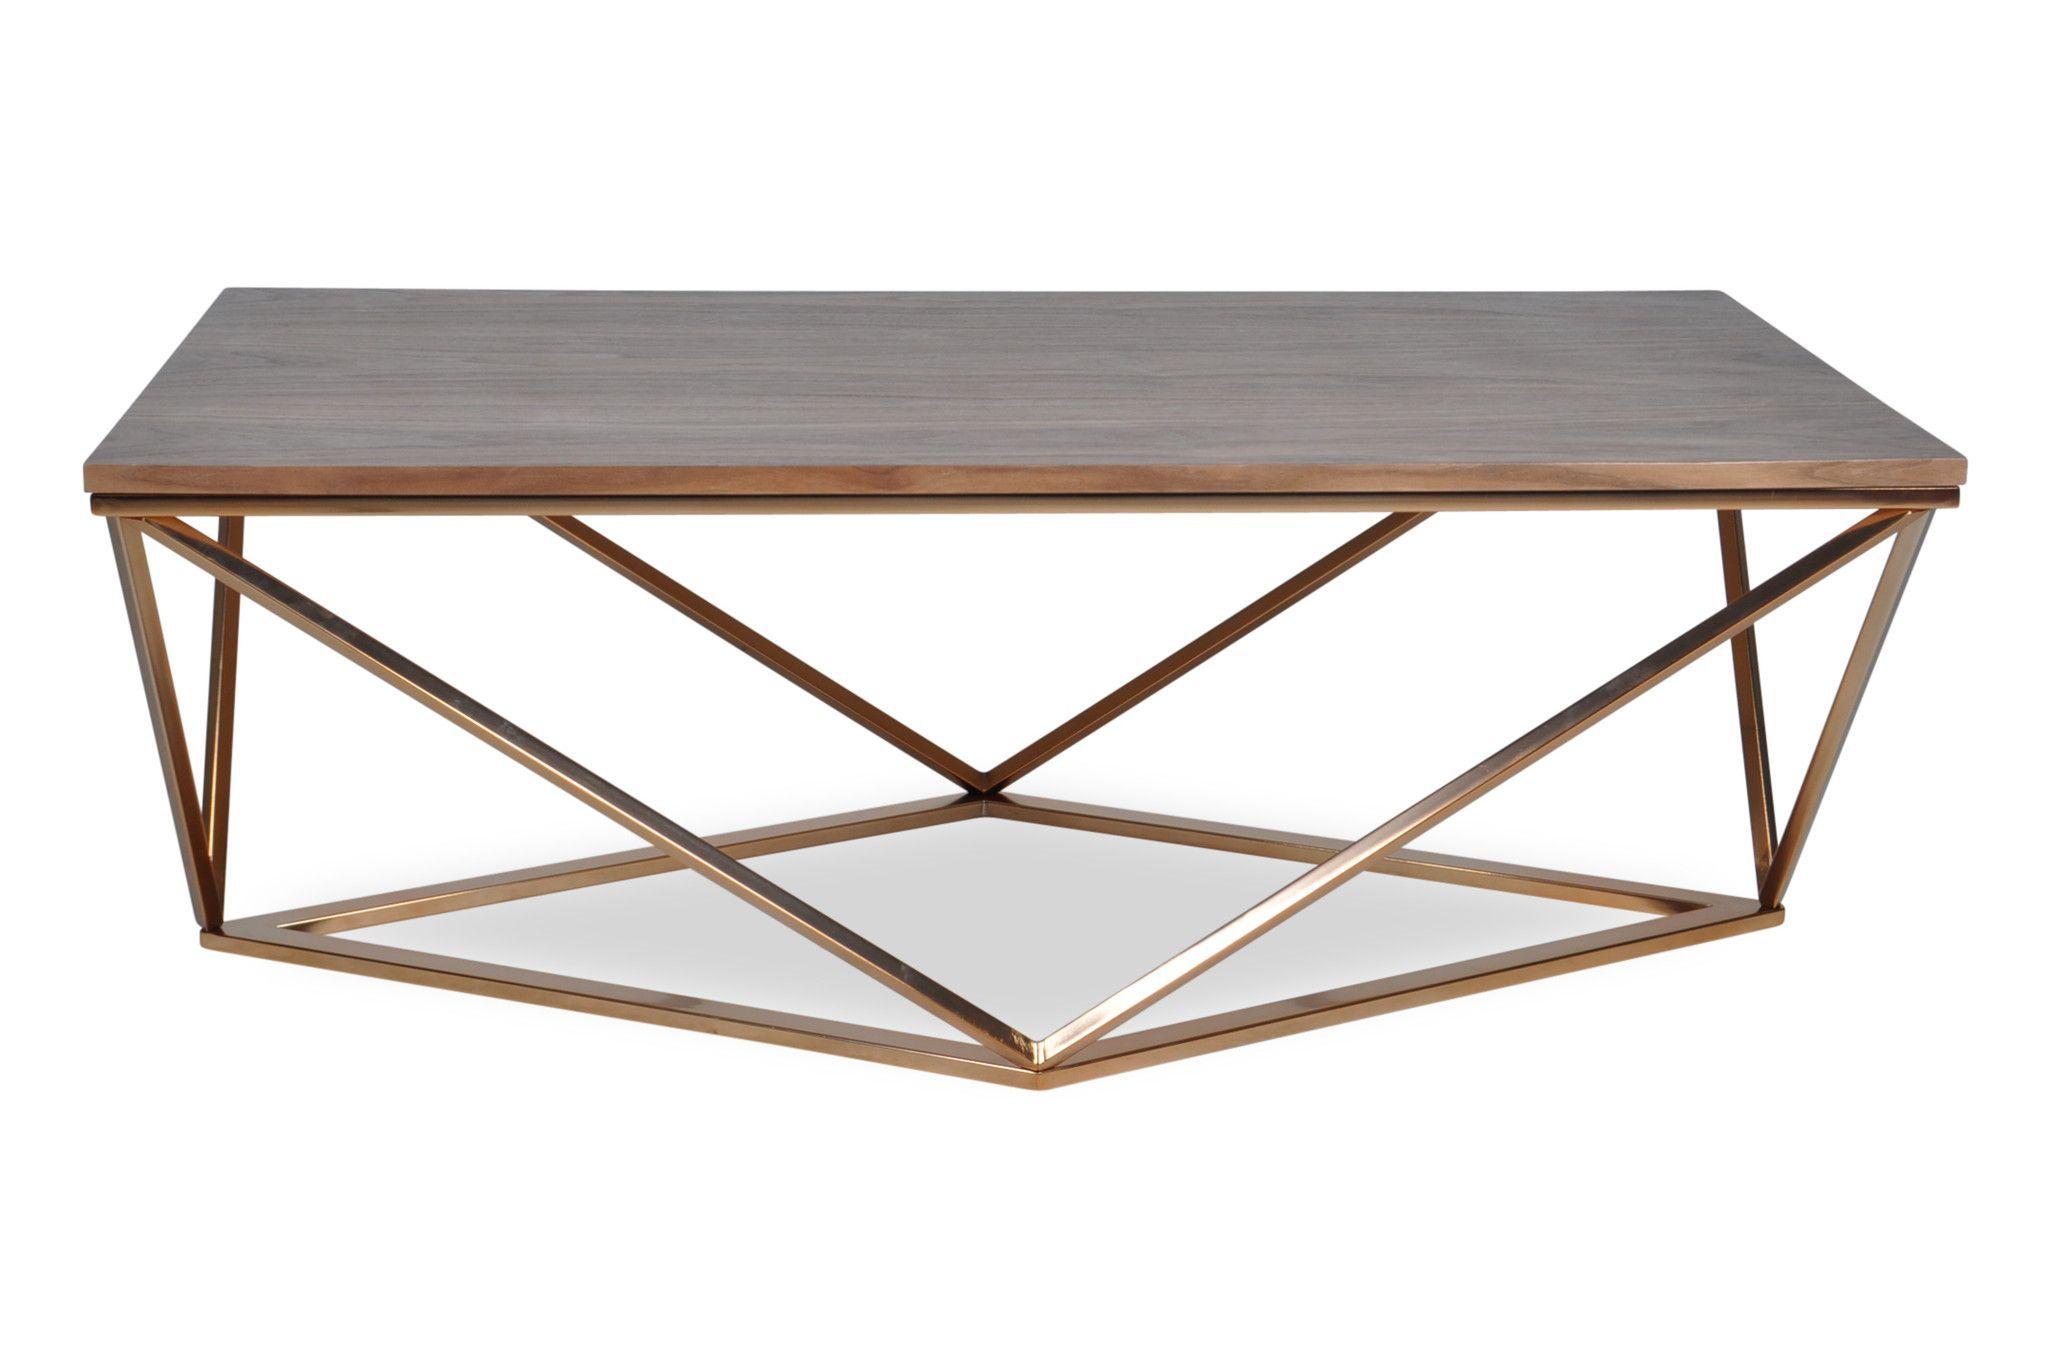 Siri Coffee Table Coffee Table Wood Table Living Room Solid Wood Coffee Table [ 1360 x 2048 Pixel ]